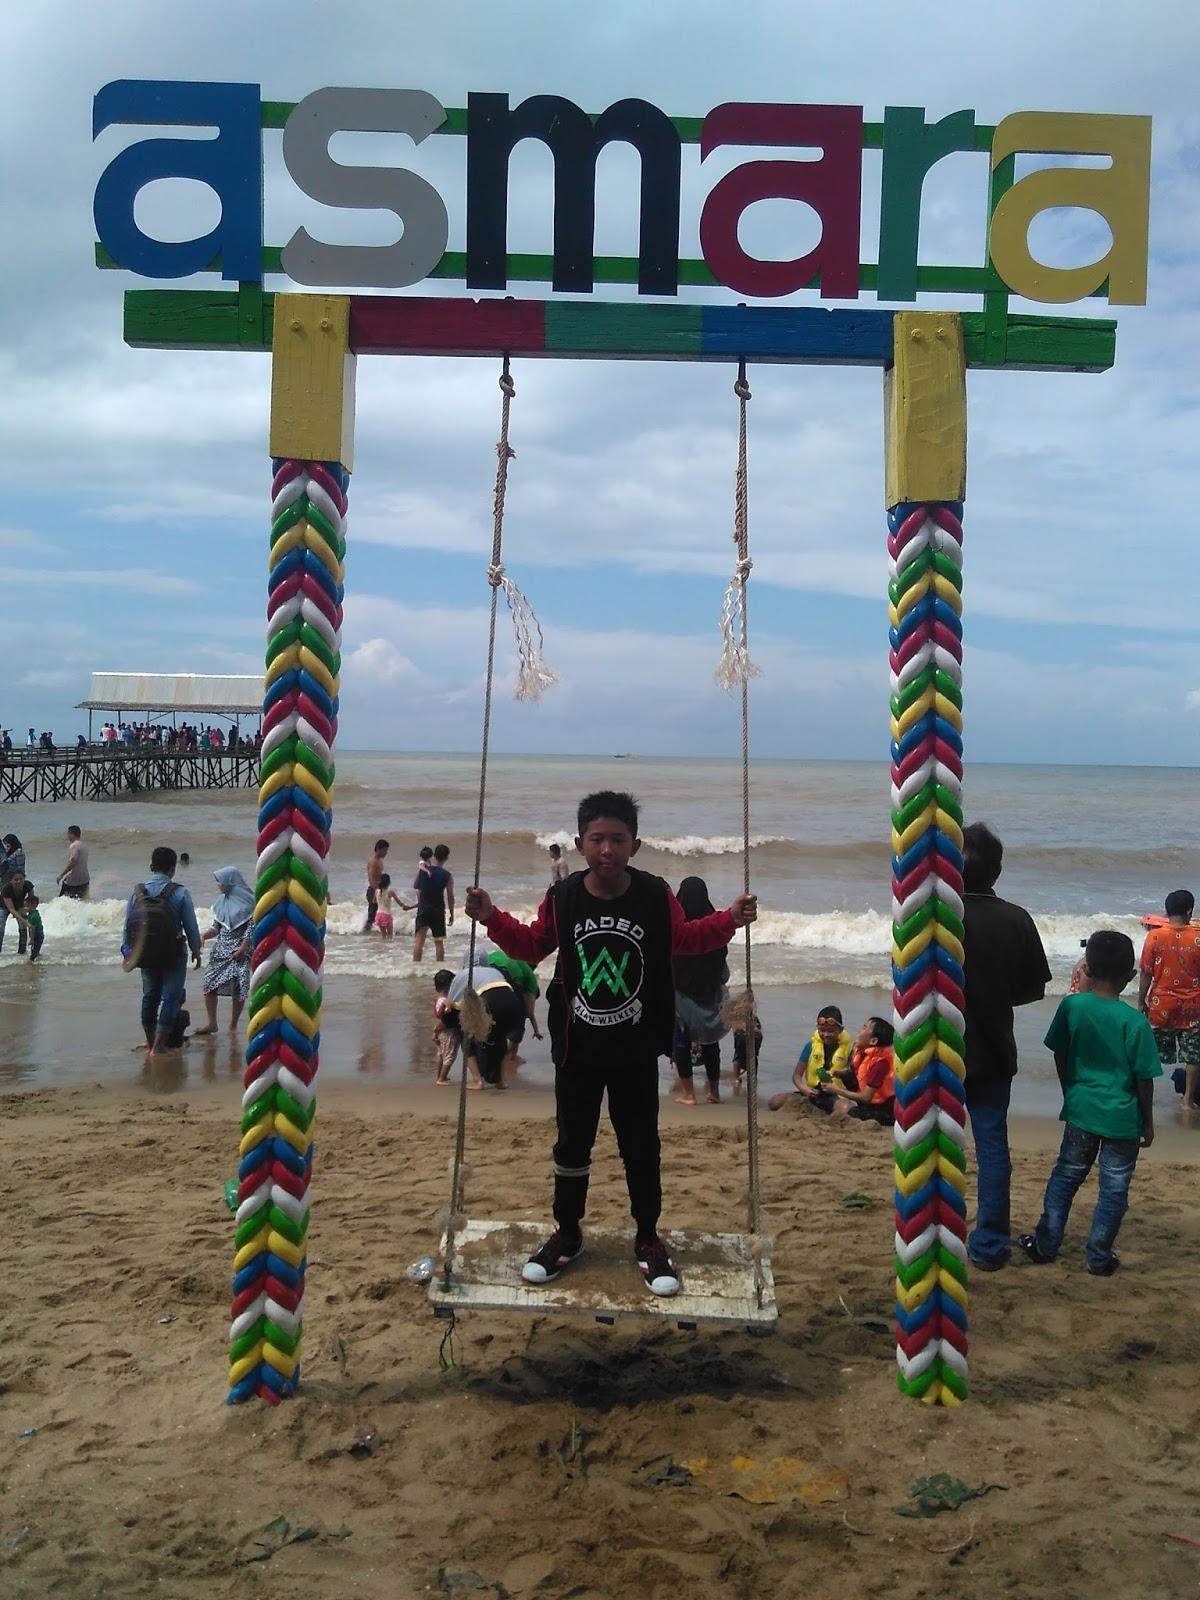 Pantai Asmara - tukangpantai